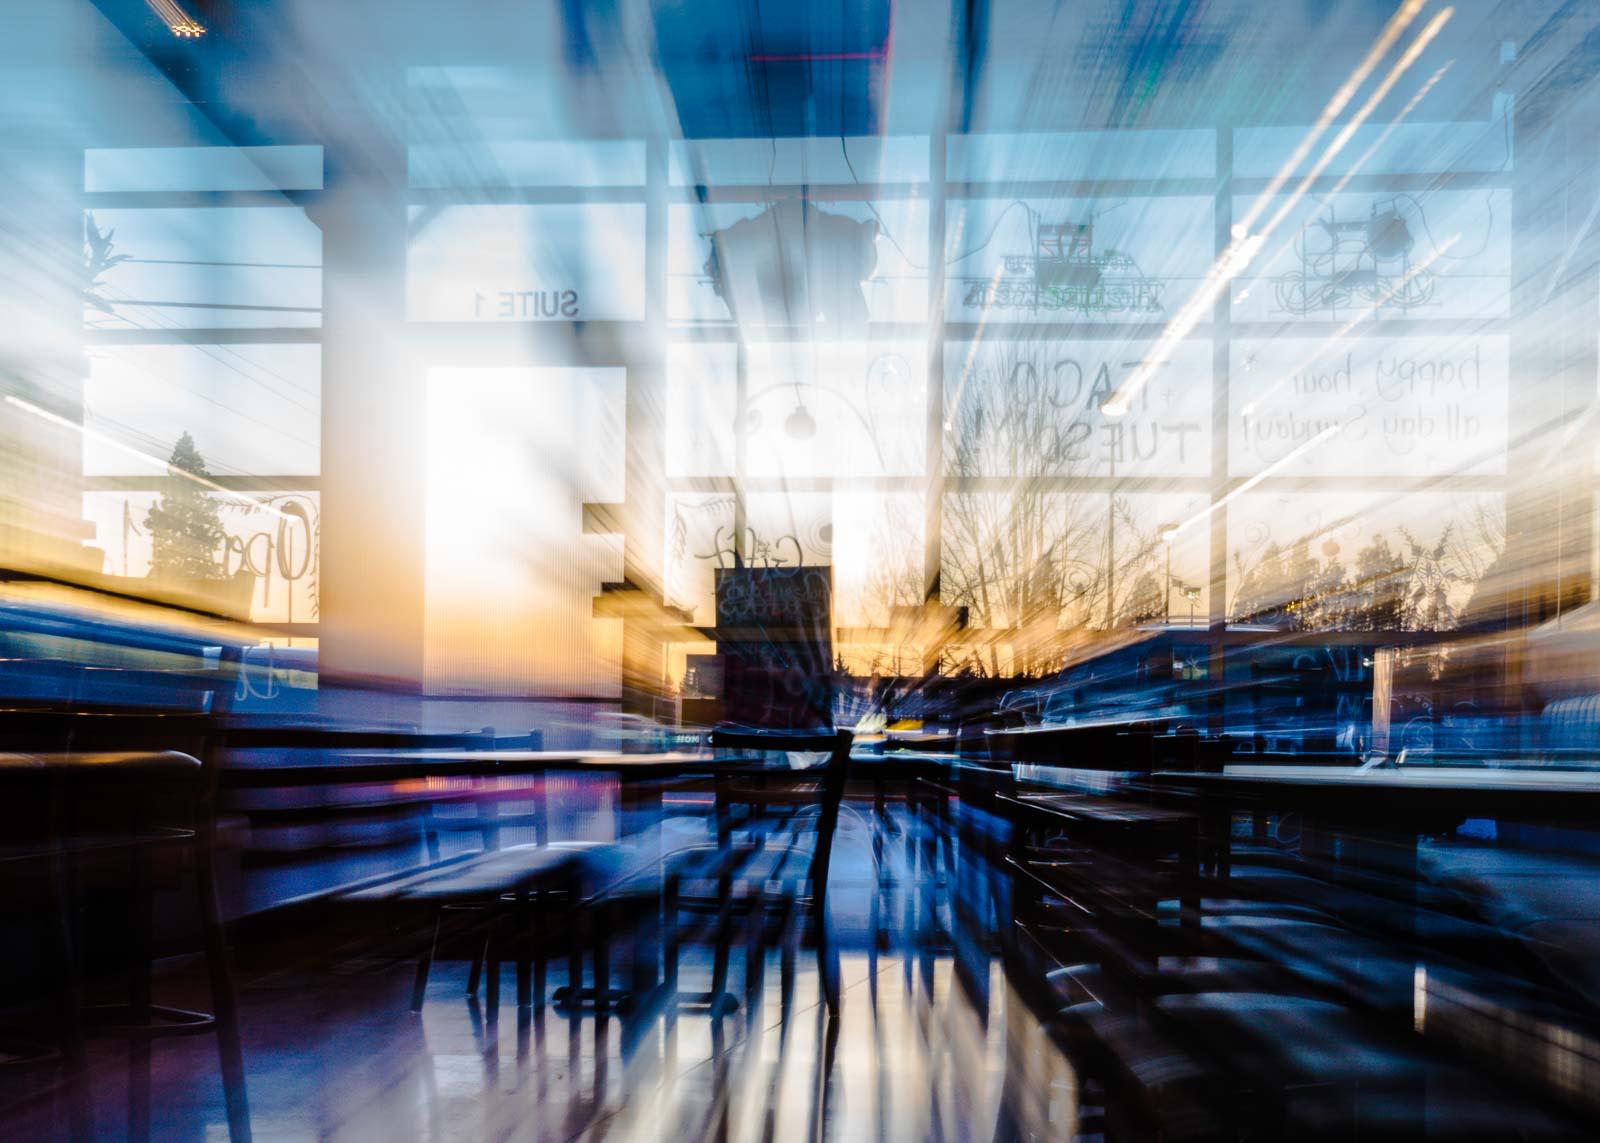 Zoom-Blur-by-Kathy-Linford-1.jpg